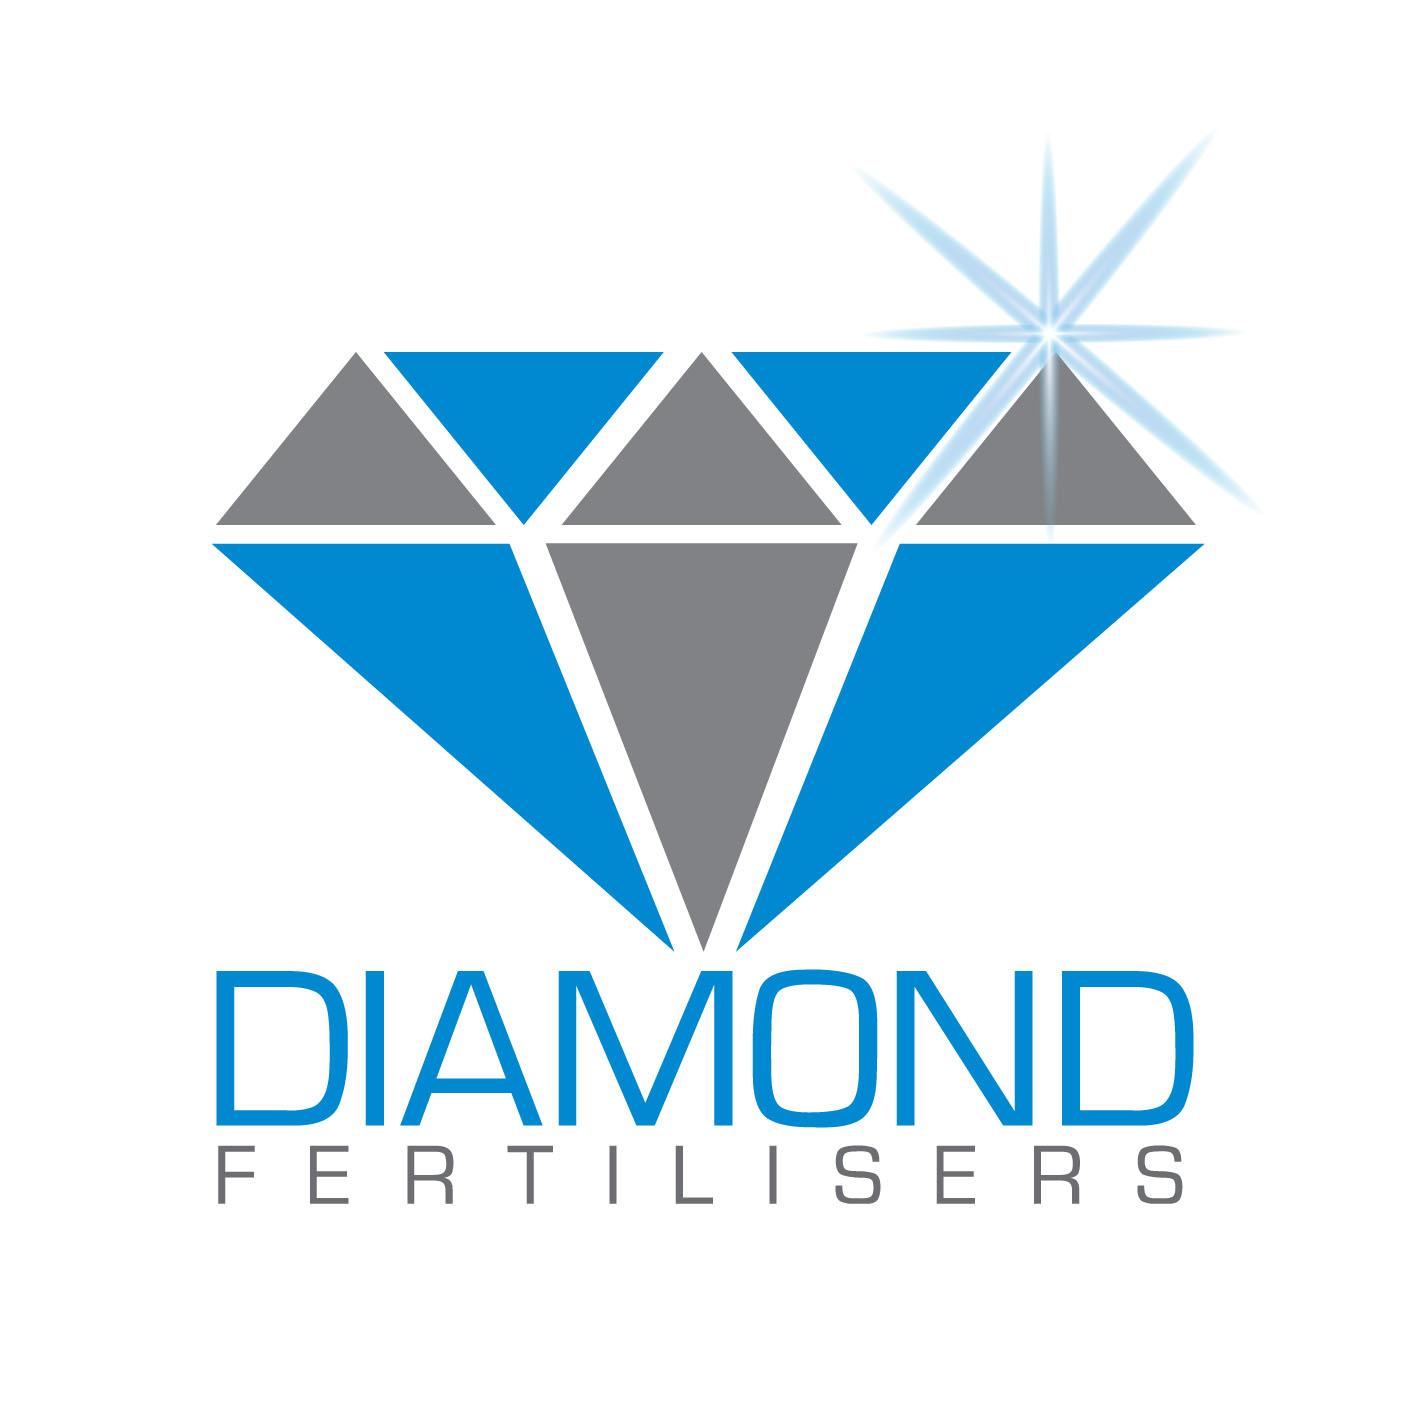 Diamond Fertilisers